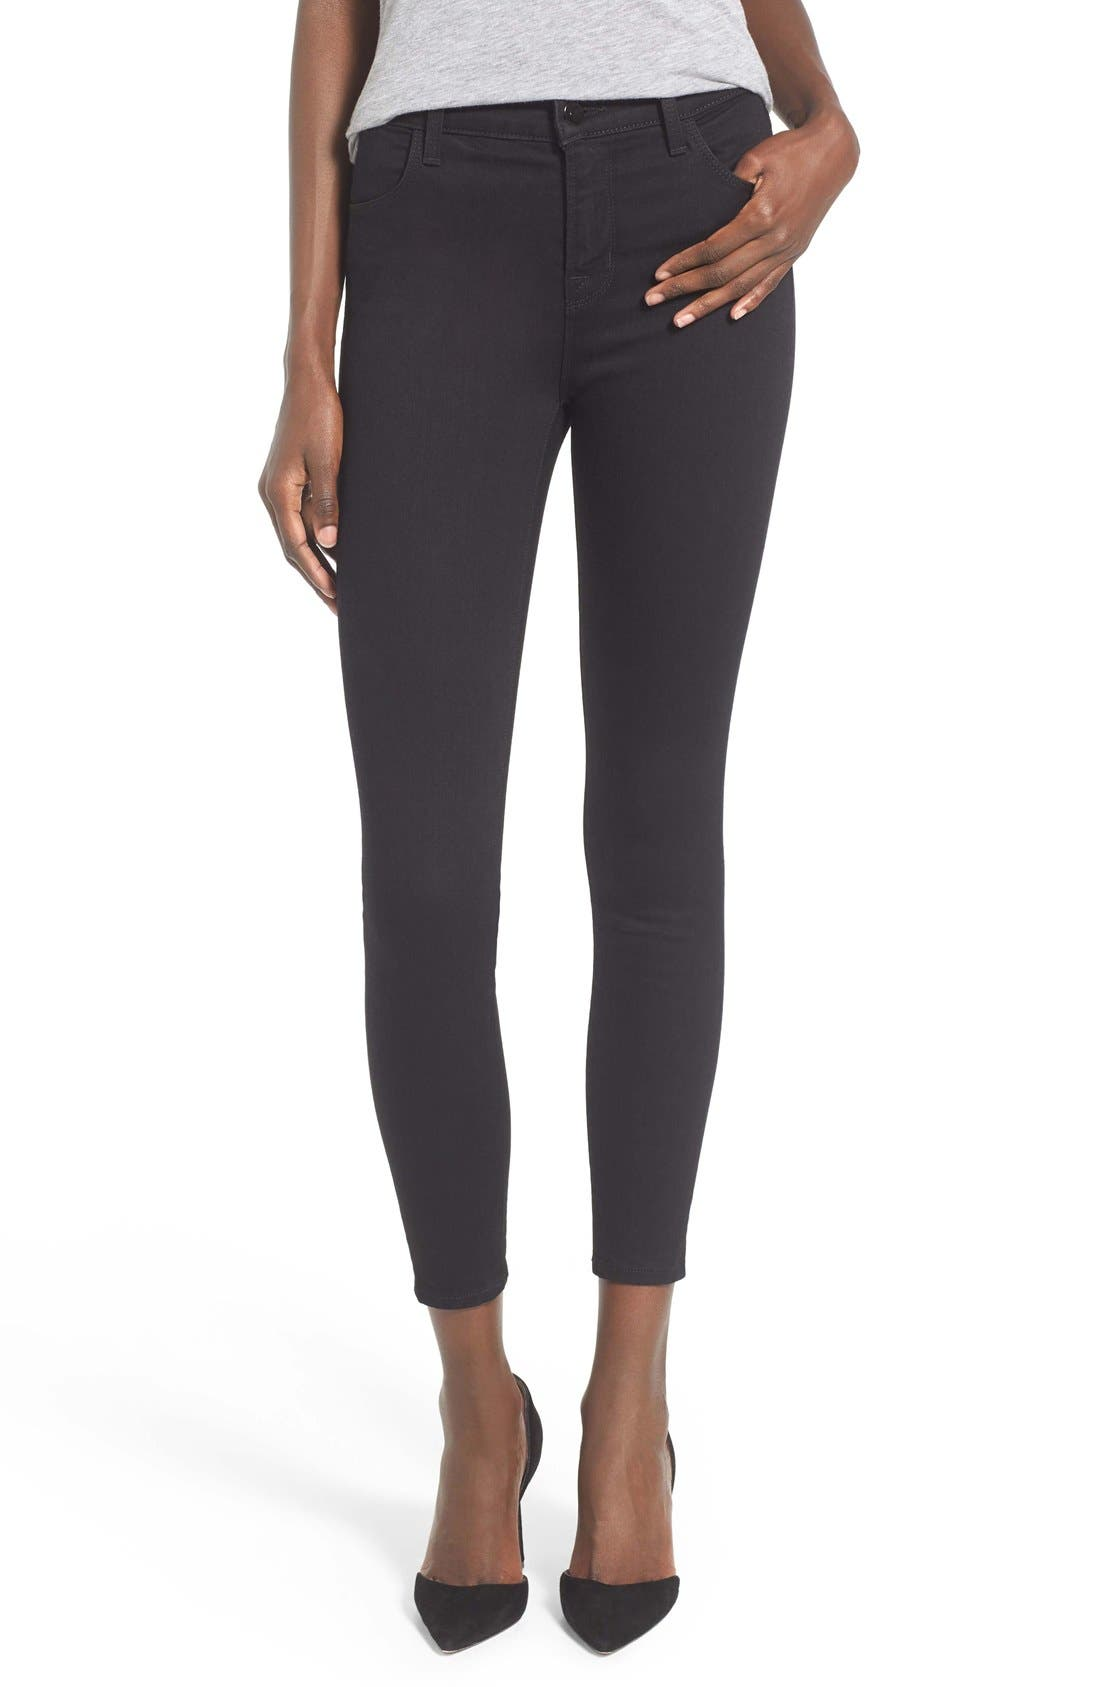 Alana High Waist Crop Skinny Jeans,                             Main thumbnail 1, color,                             002